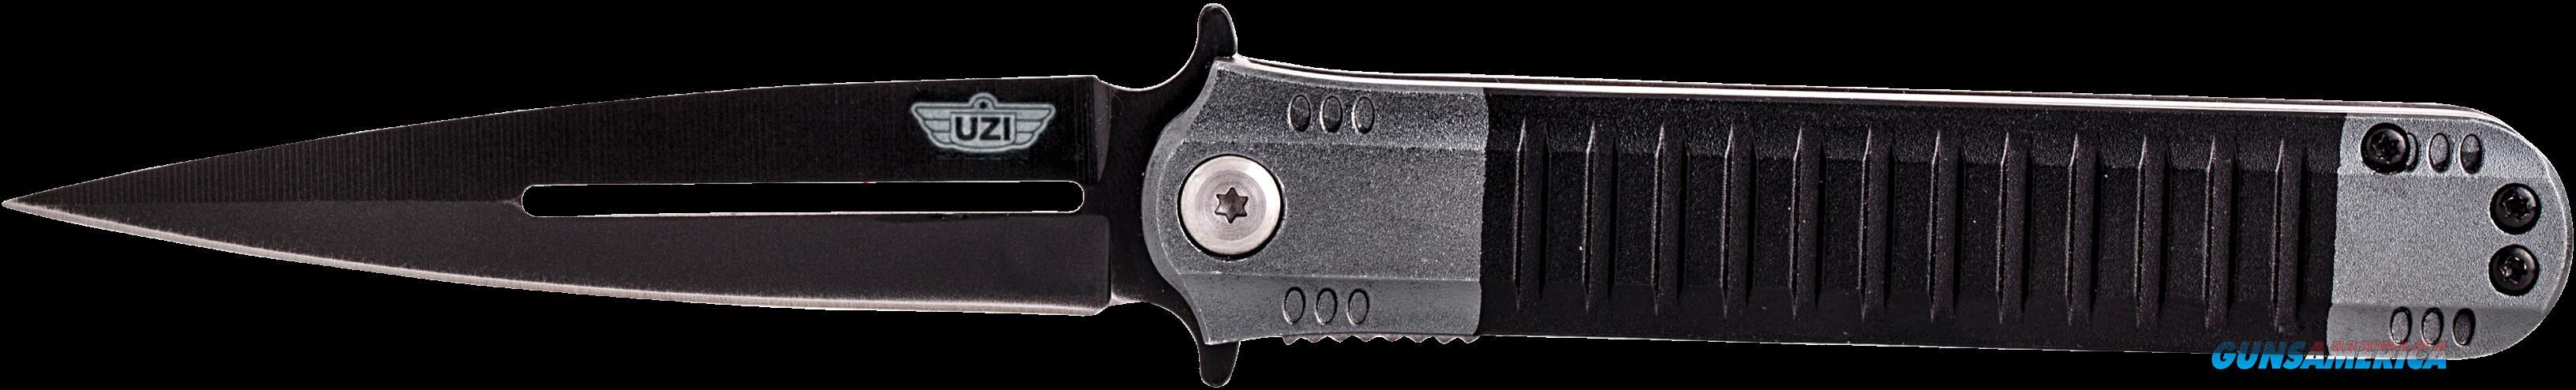 Uzi Accessories Covert, Camp Uzkfdr009    Uzi Covert Knife  Guns > Pistols > 1911 Pistol Copies (non-Colt)